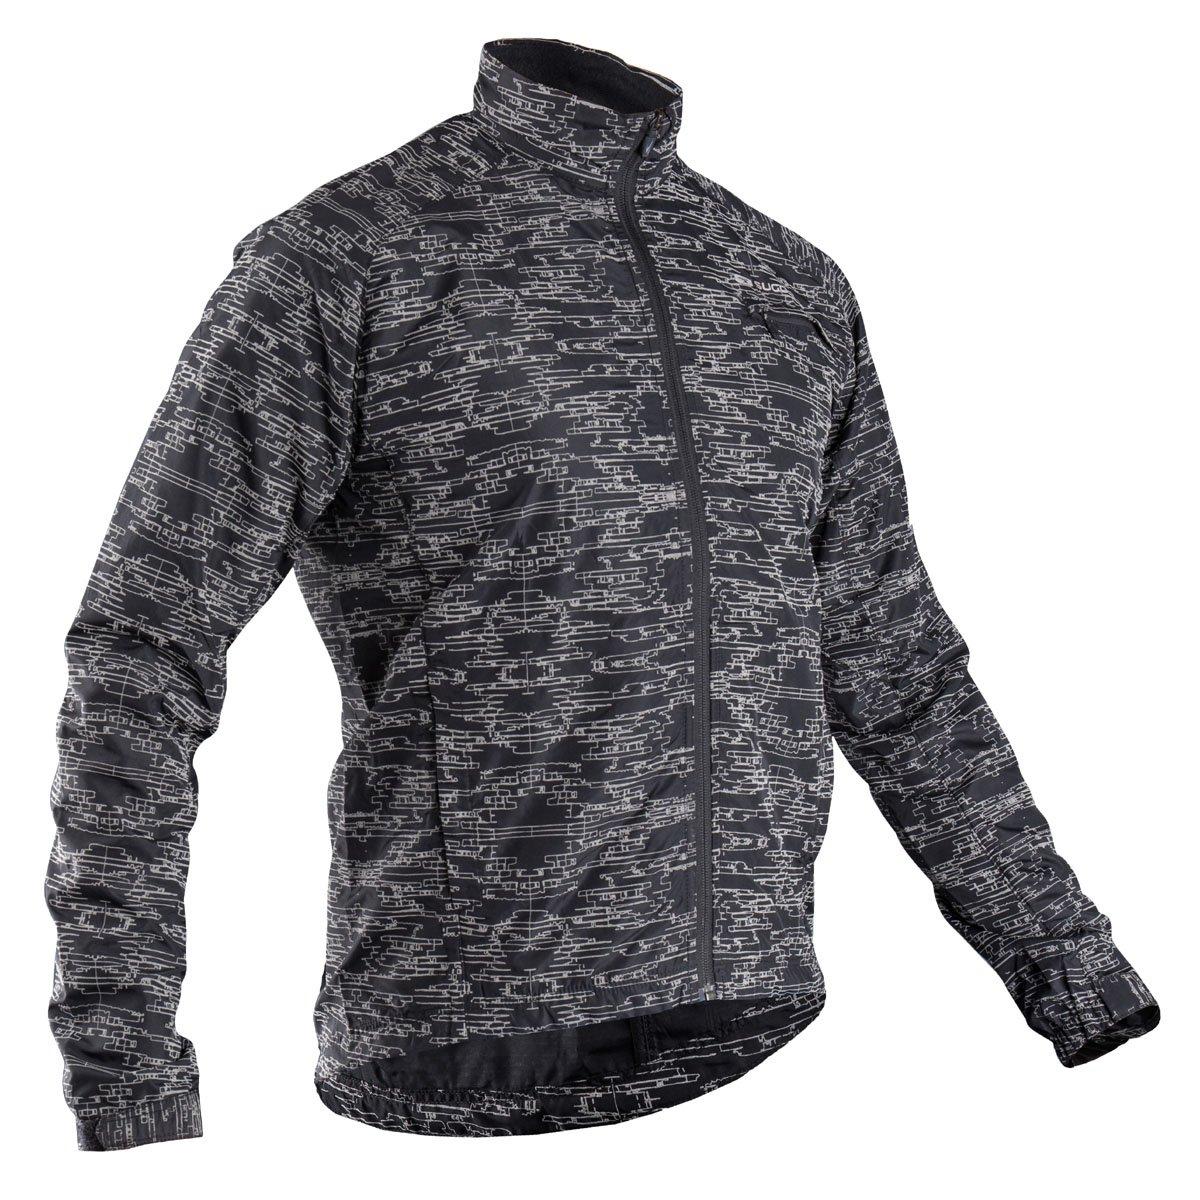 Sugoi Men's Zap Run Jacket, Black, Large by SUGOi